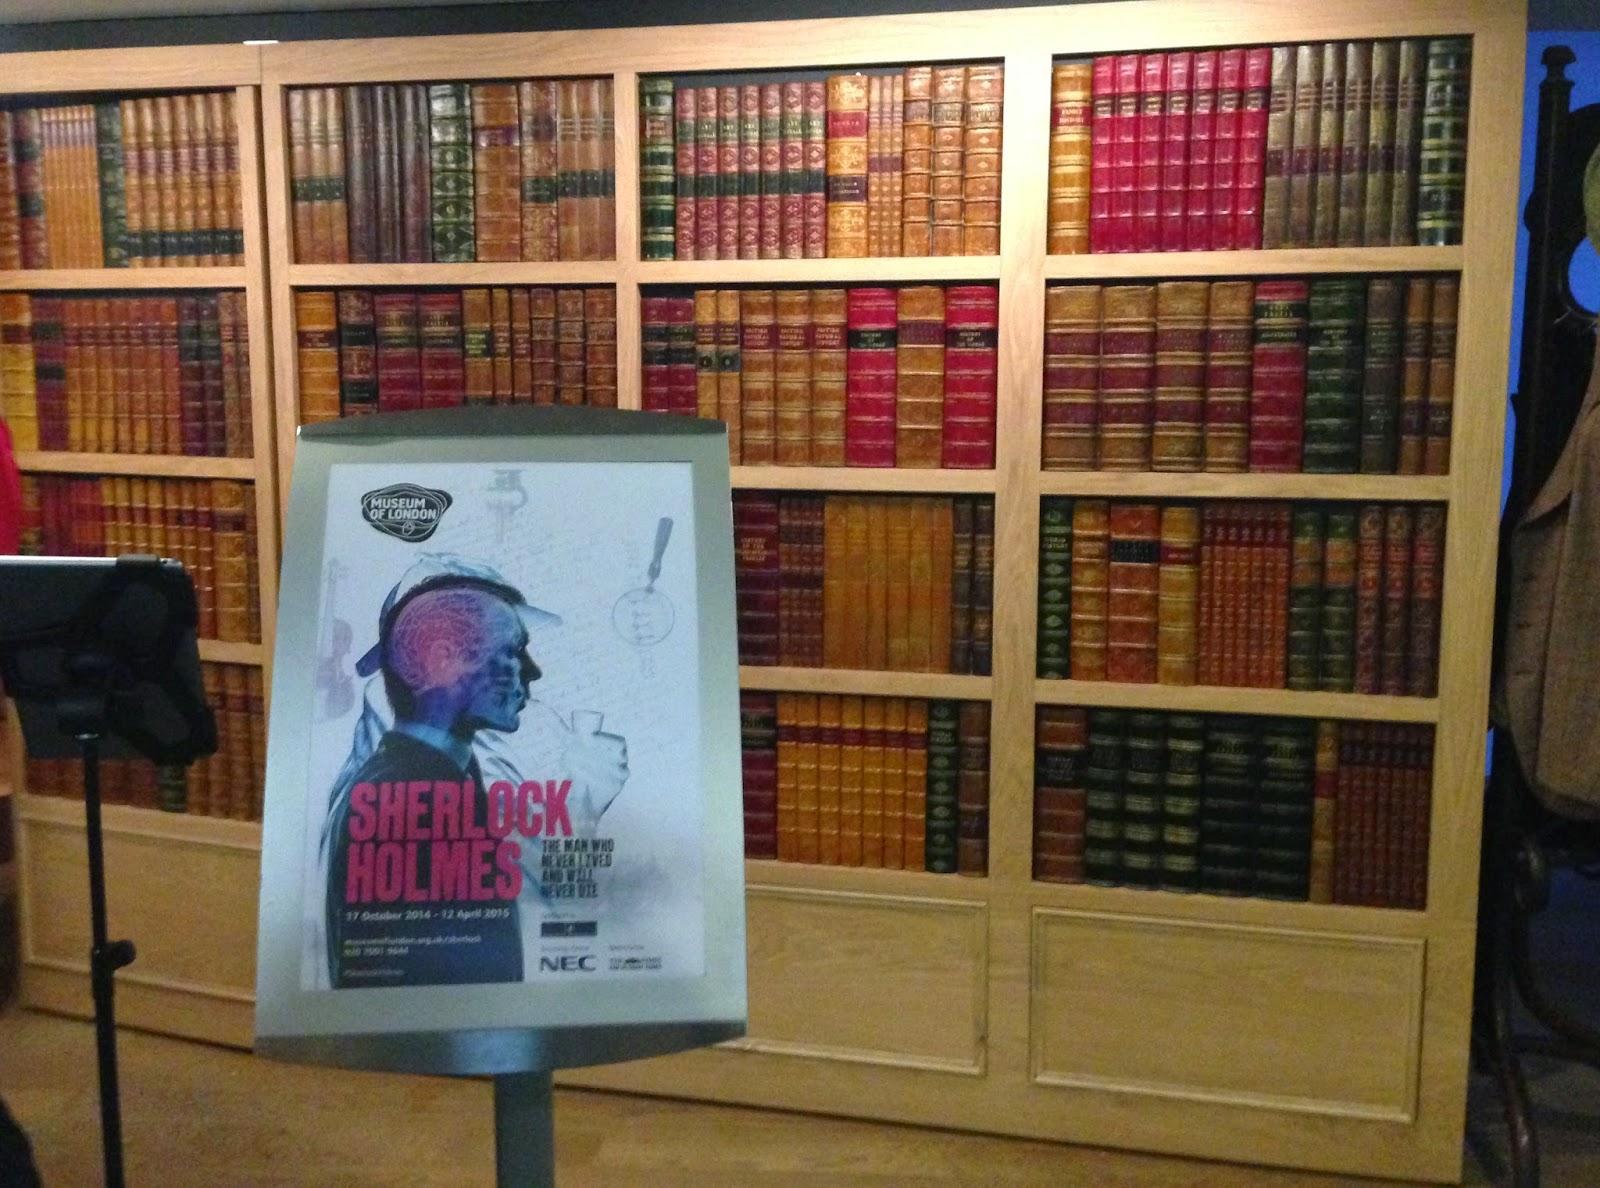 Museum of London Sherlock Holmes